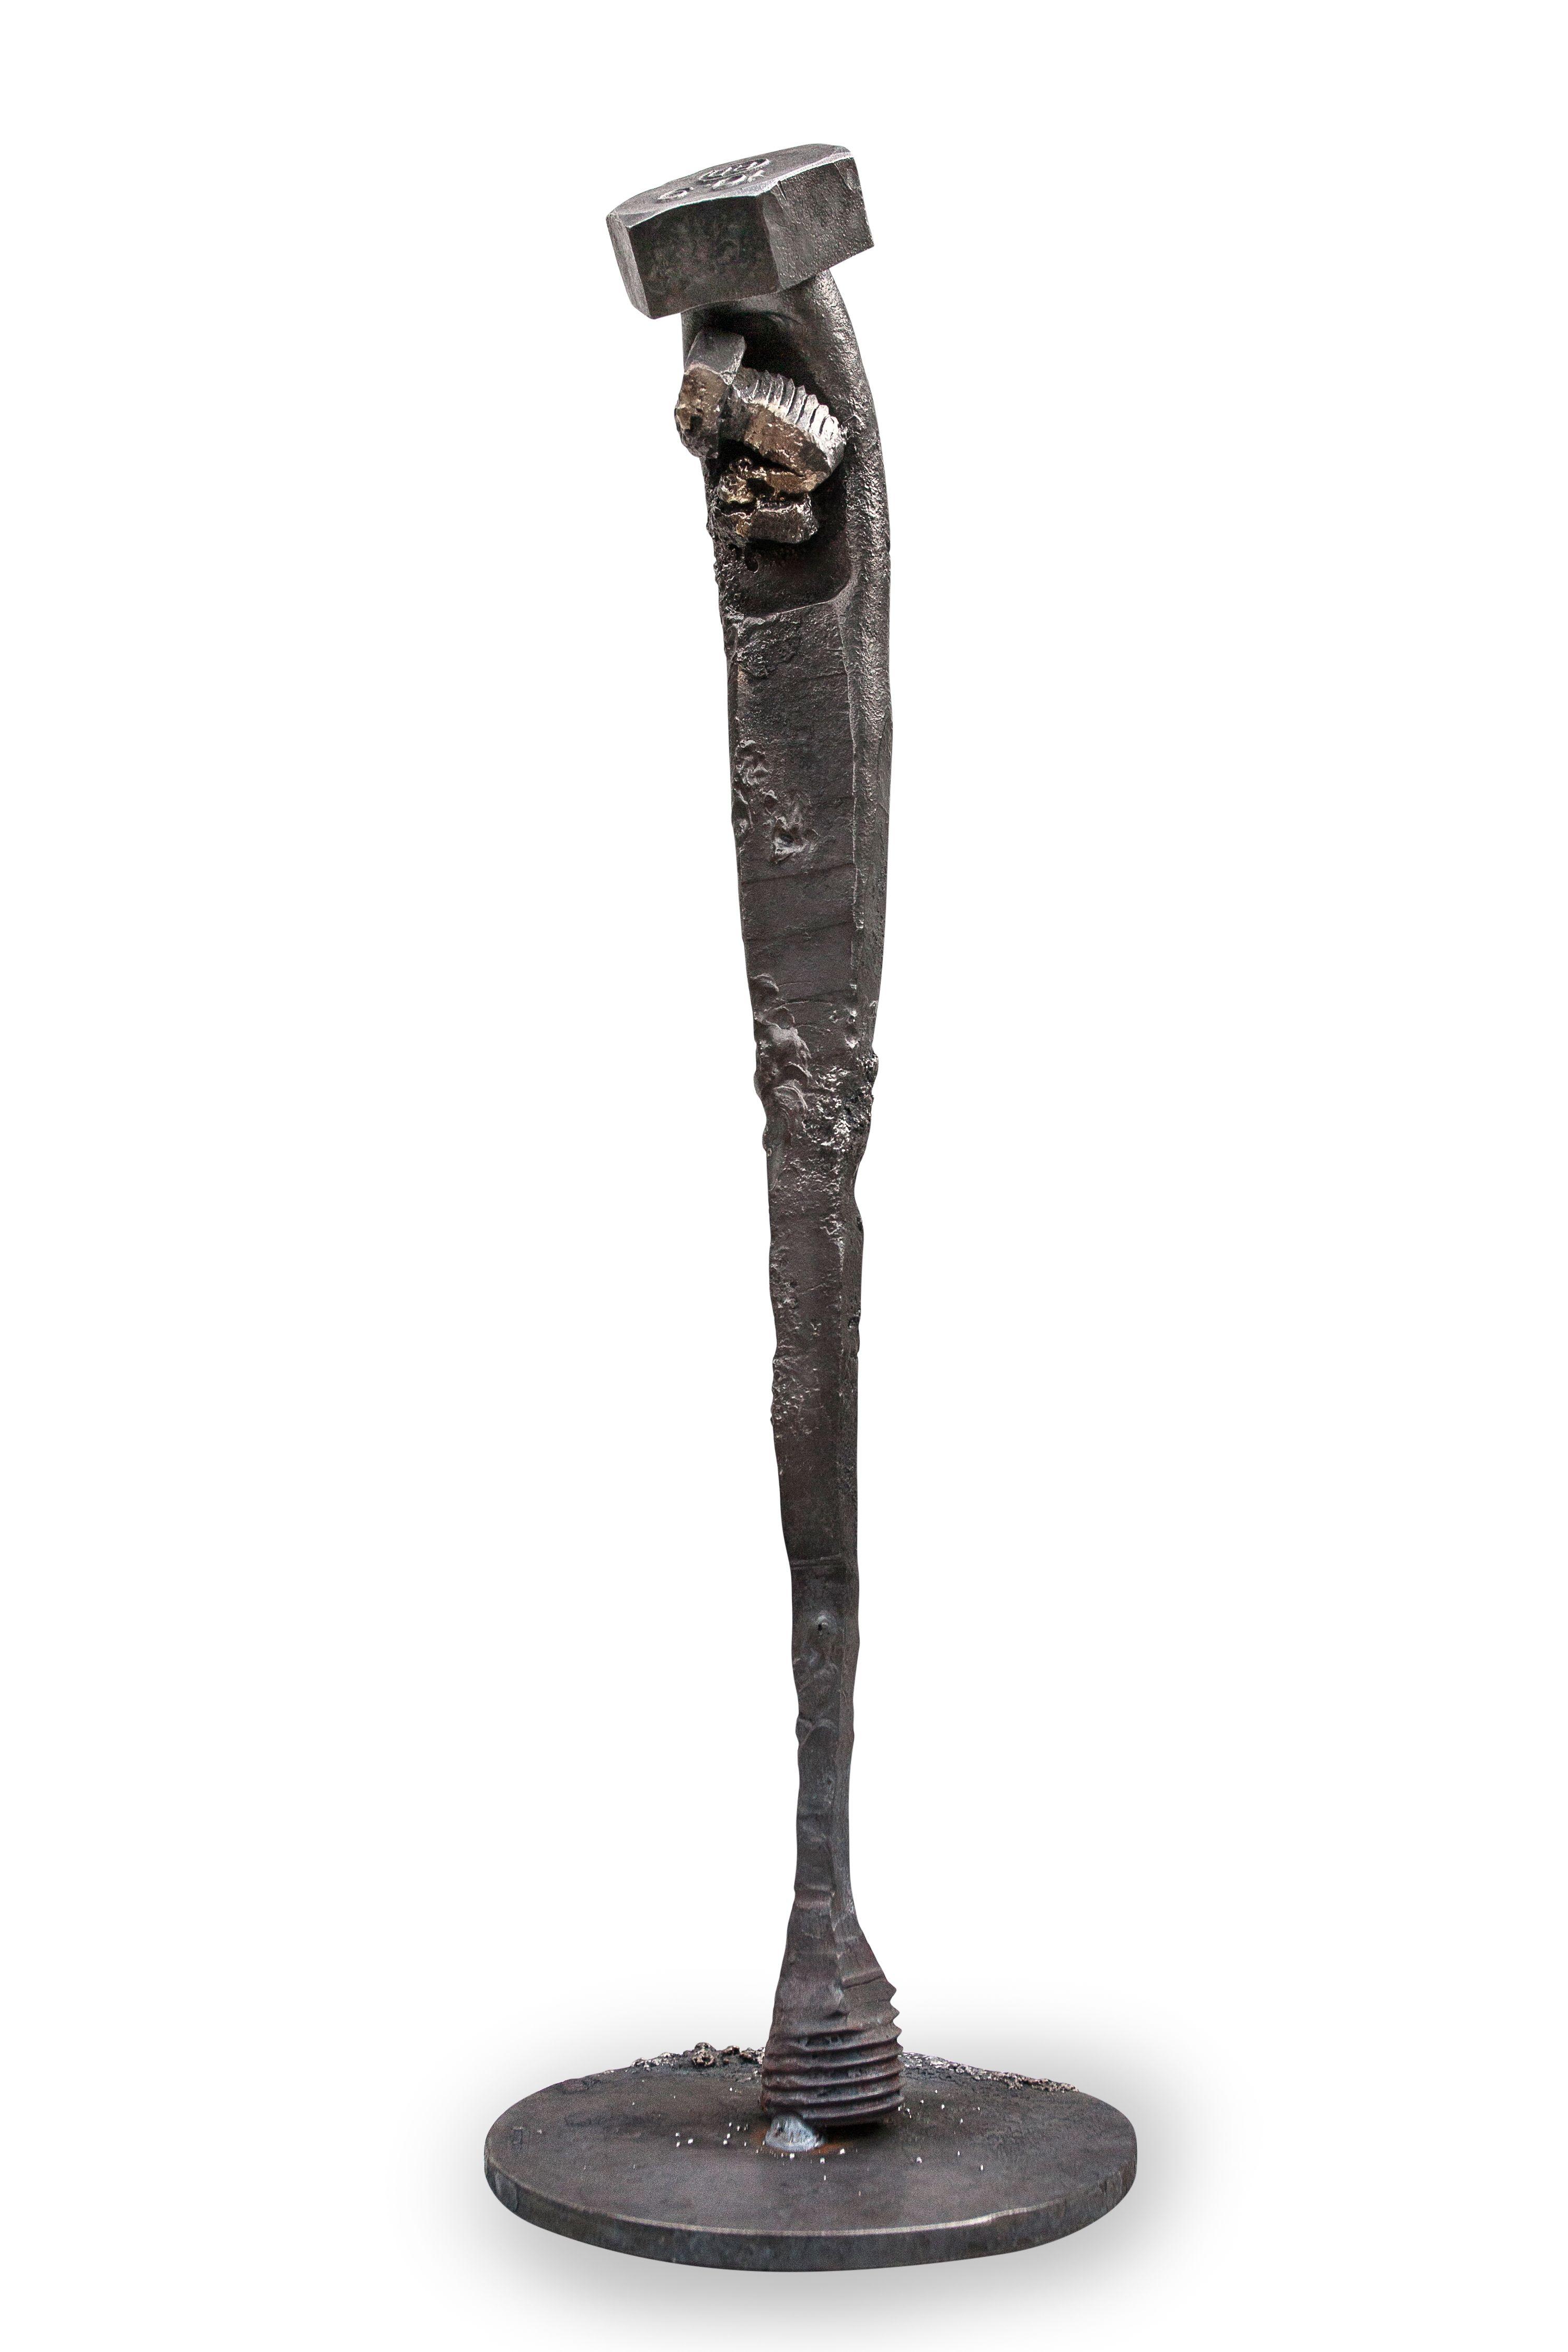 Boltpoetry V Vi 0 By The Norwegian Artist Tobbe Malm Contemporarart Metalsculpture Futuristic Steampunk Dieselpunk Metal Sculpture Metal Art Sculptures